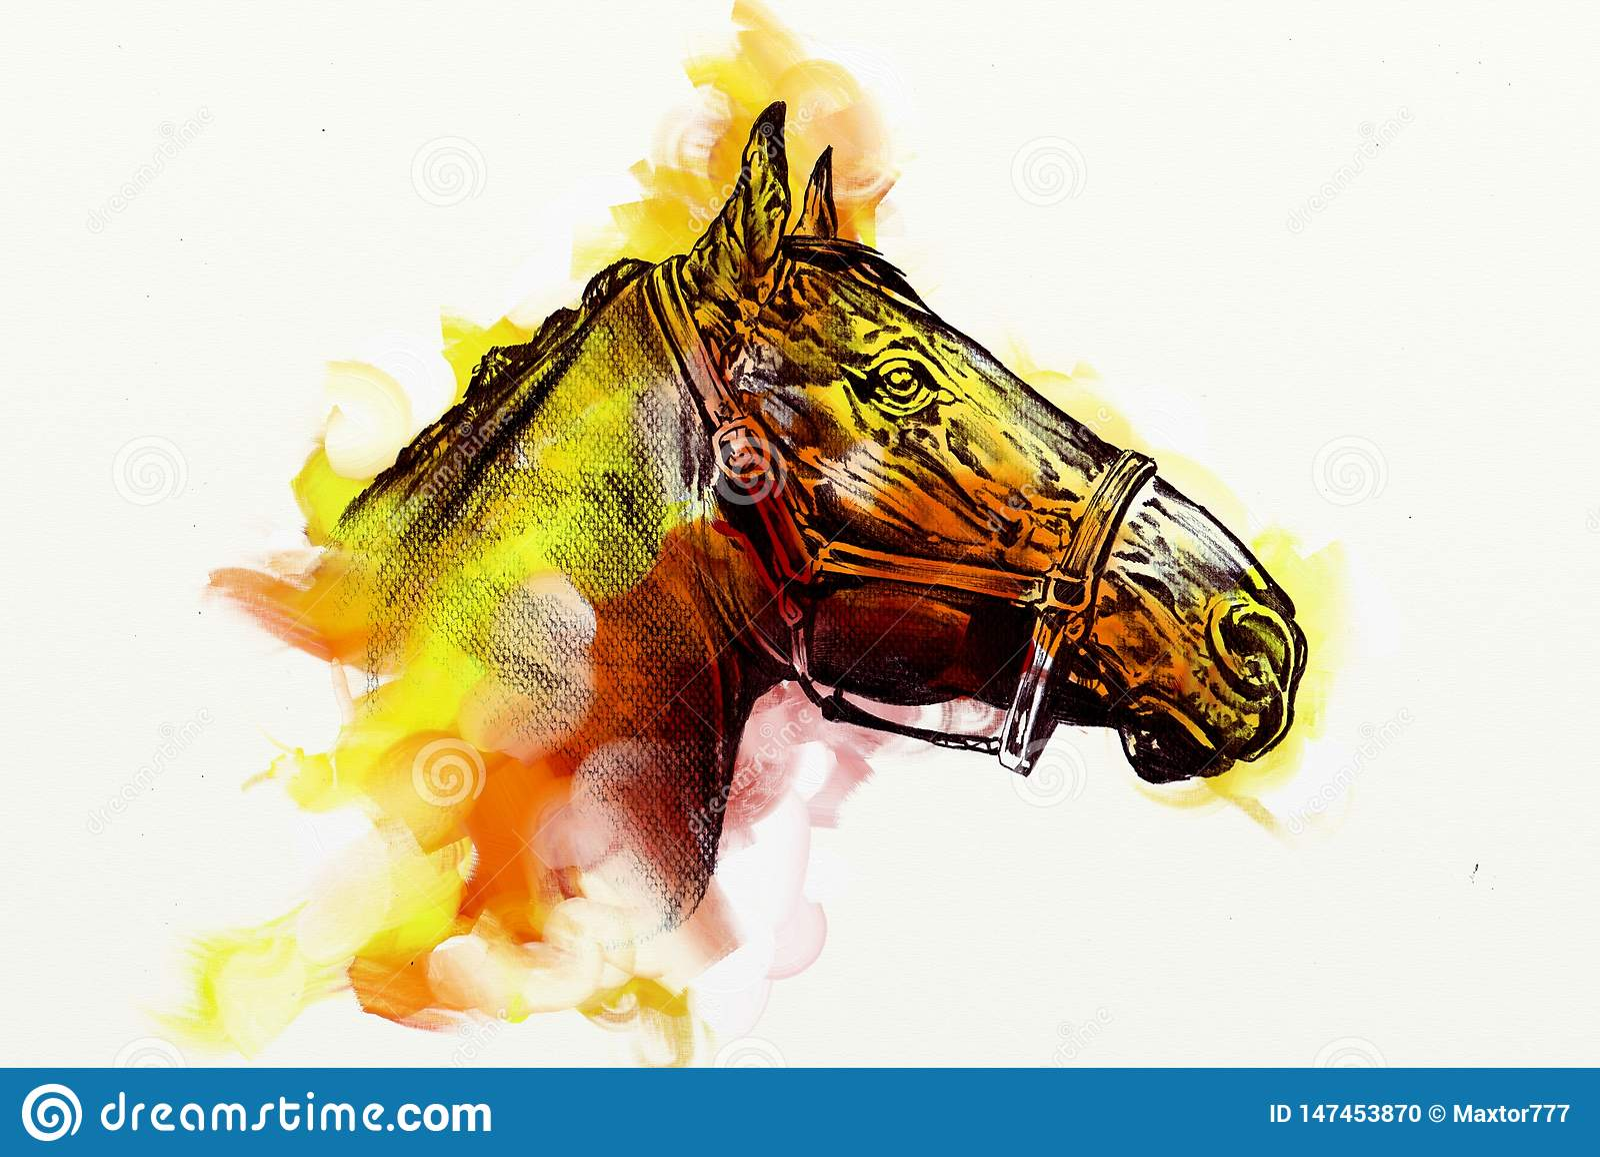 Original Oil Painting Of A Fine Arabian Horse Funny Artwork Stock Illustration Illustration Of Stallion Black 147453870